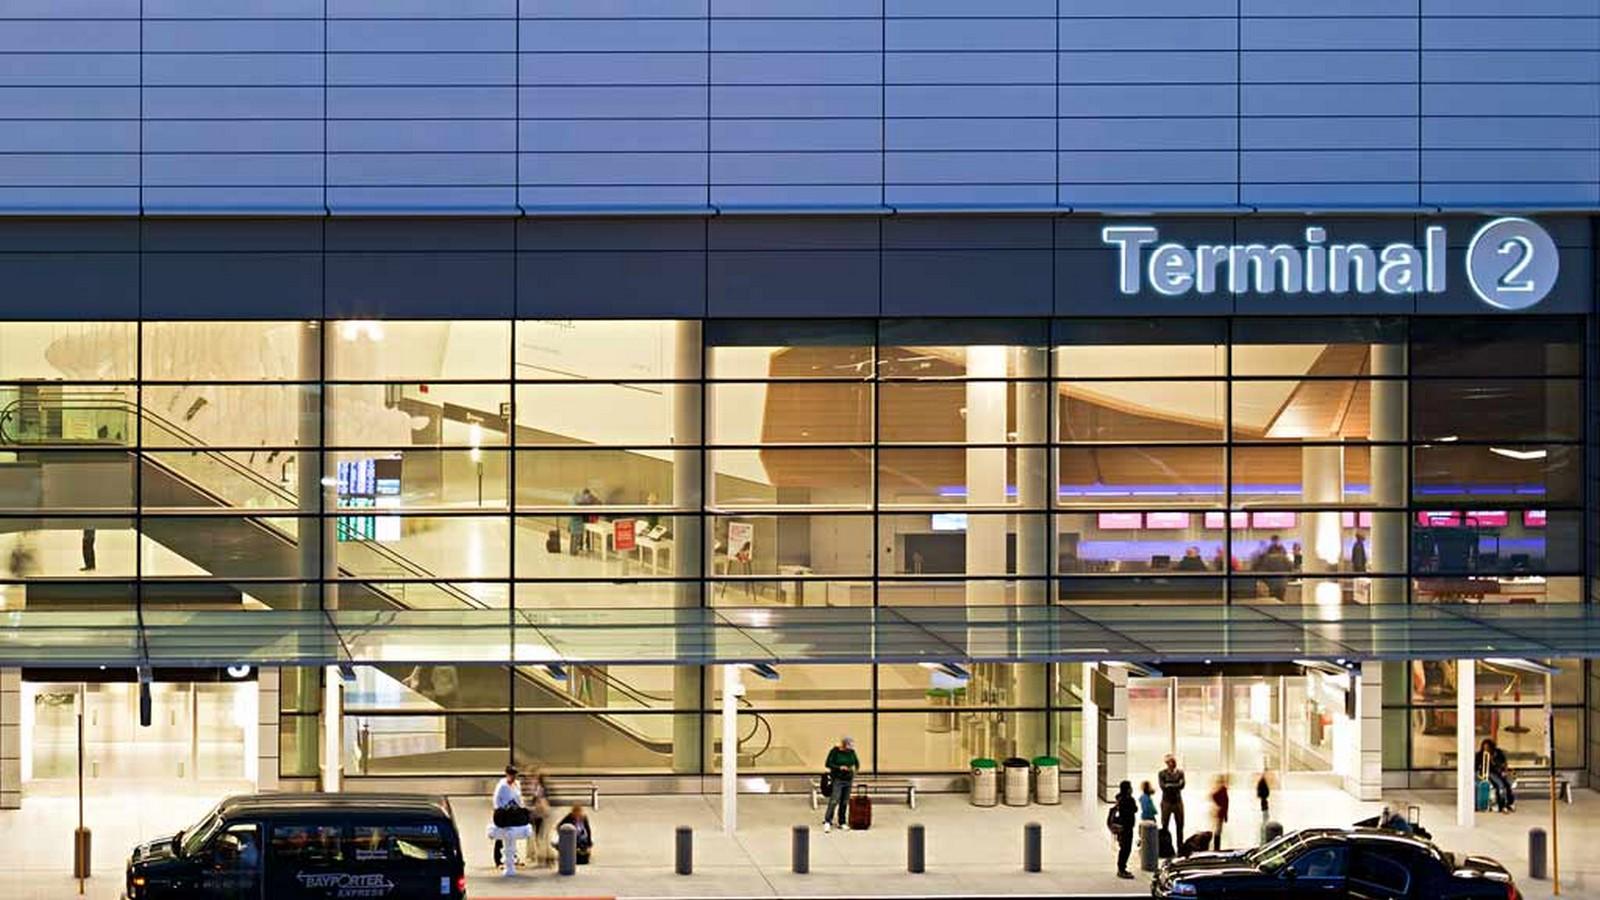 Terminal 2 - San Francisco International Airport - Sheet2